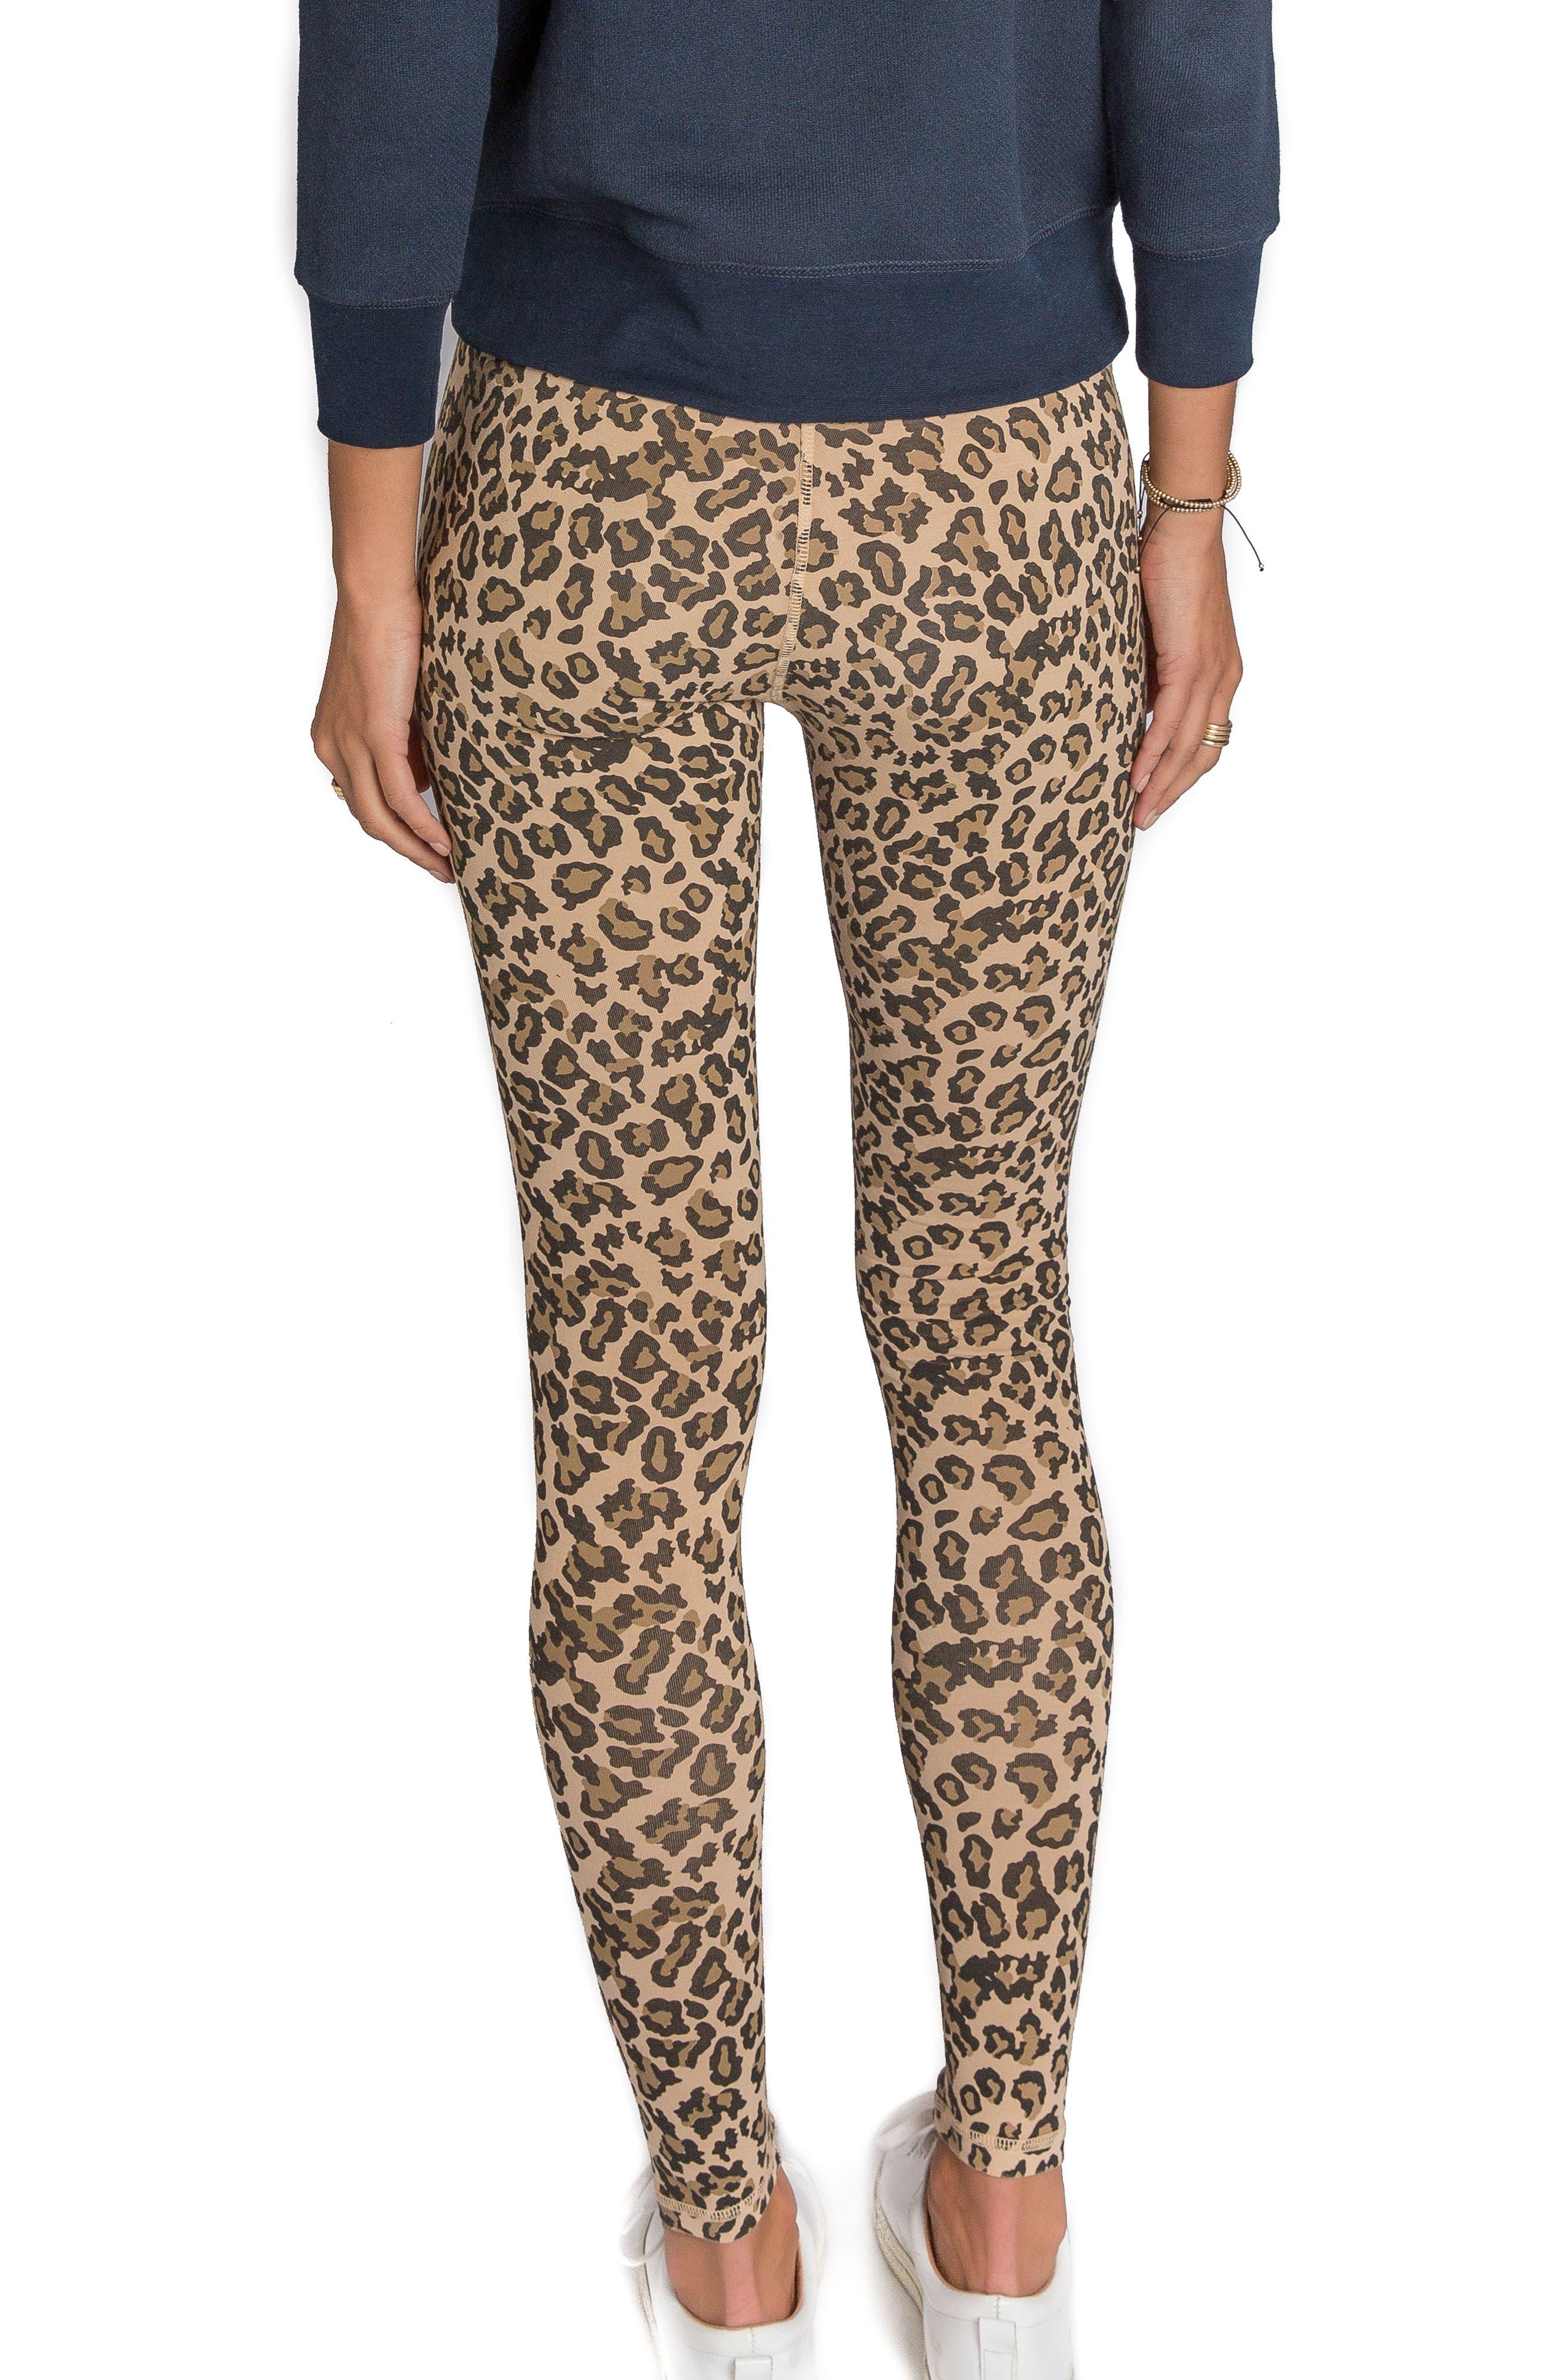 Leopard Print Leggings,                             Alternate thumbnail 2, color,                             250